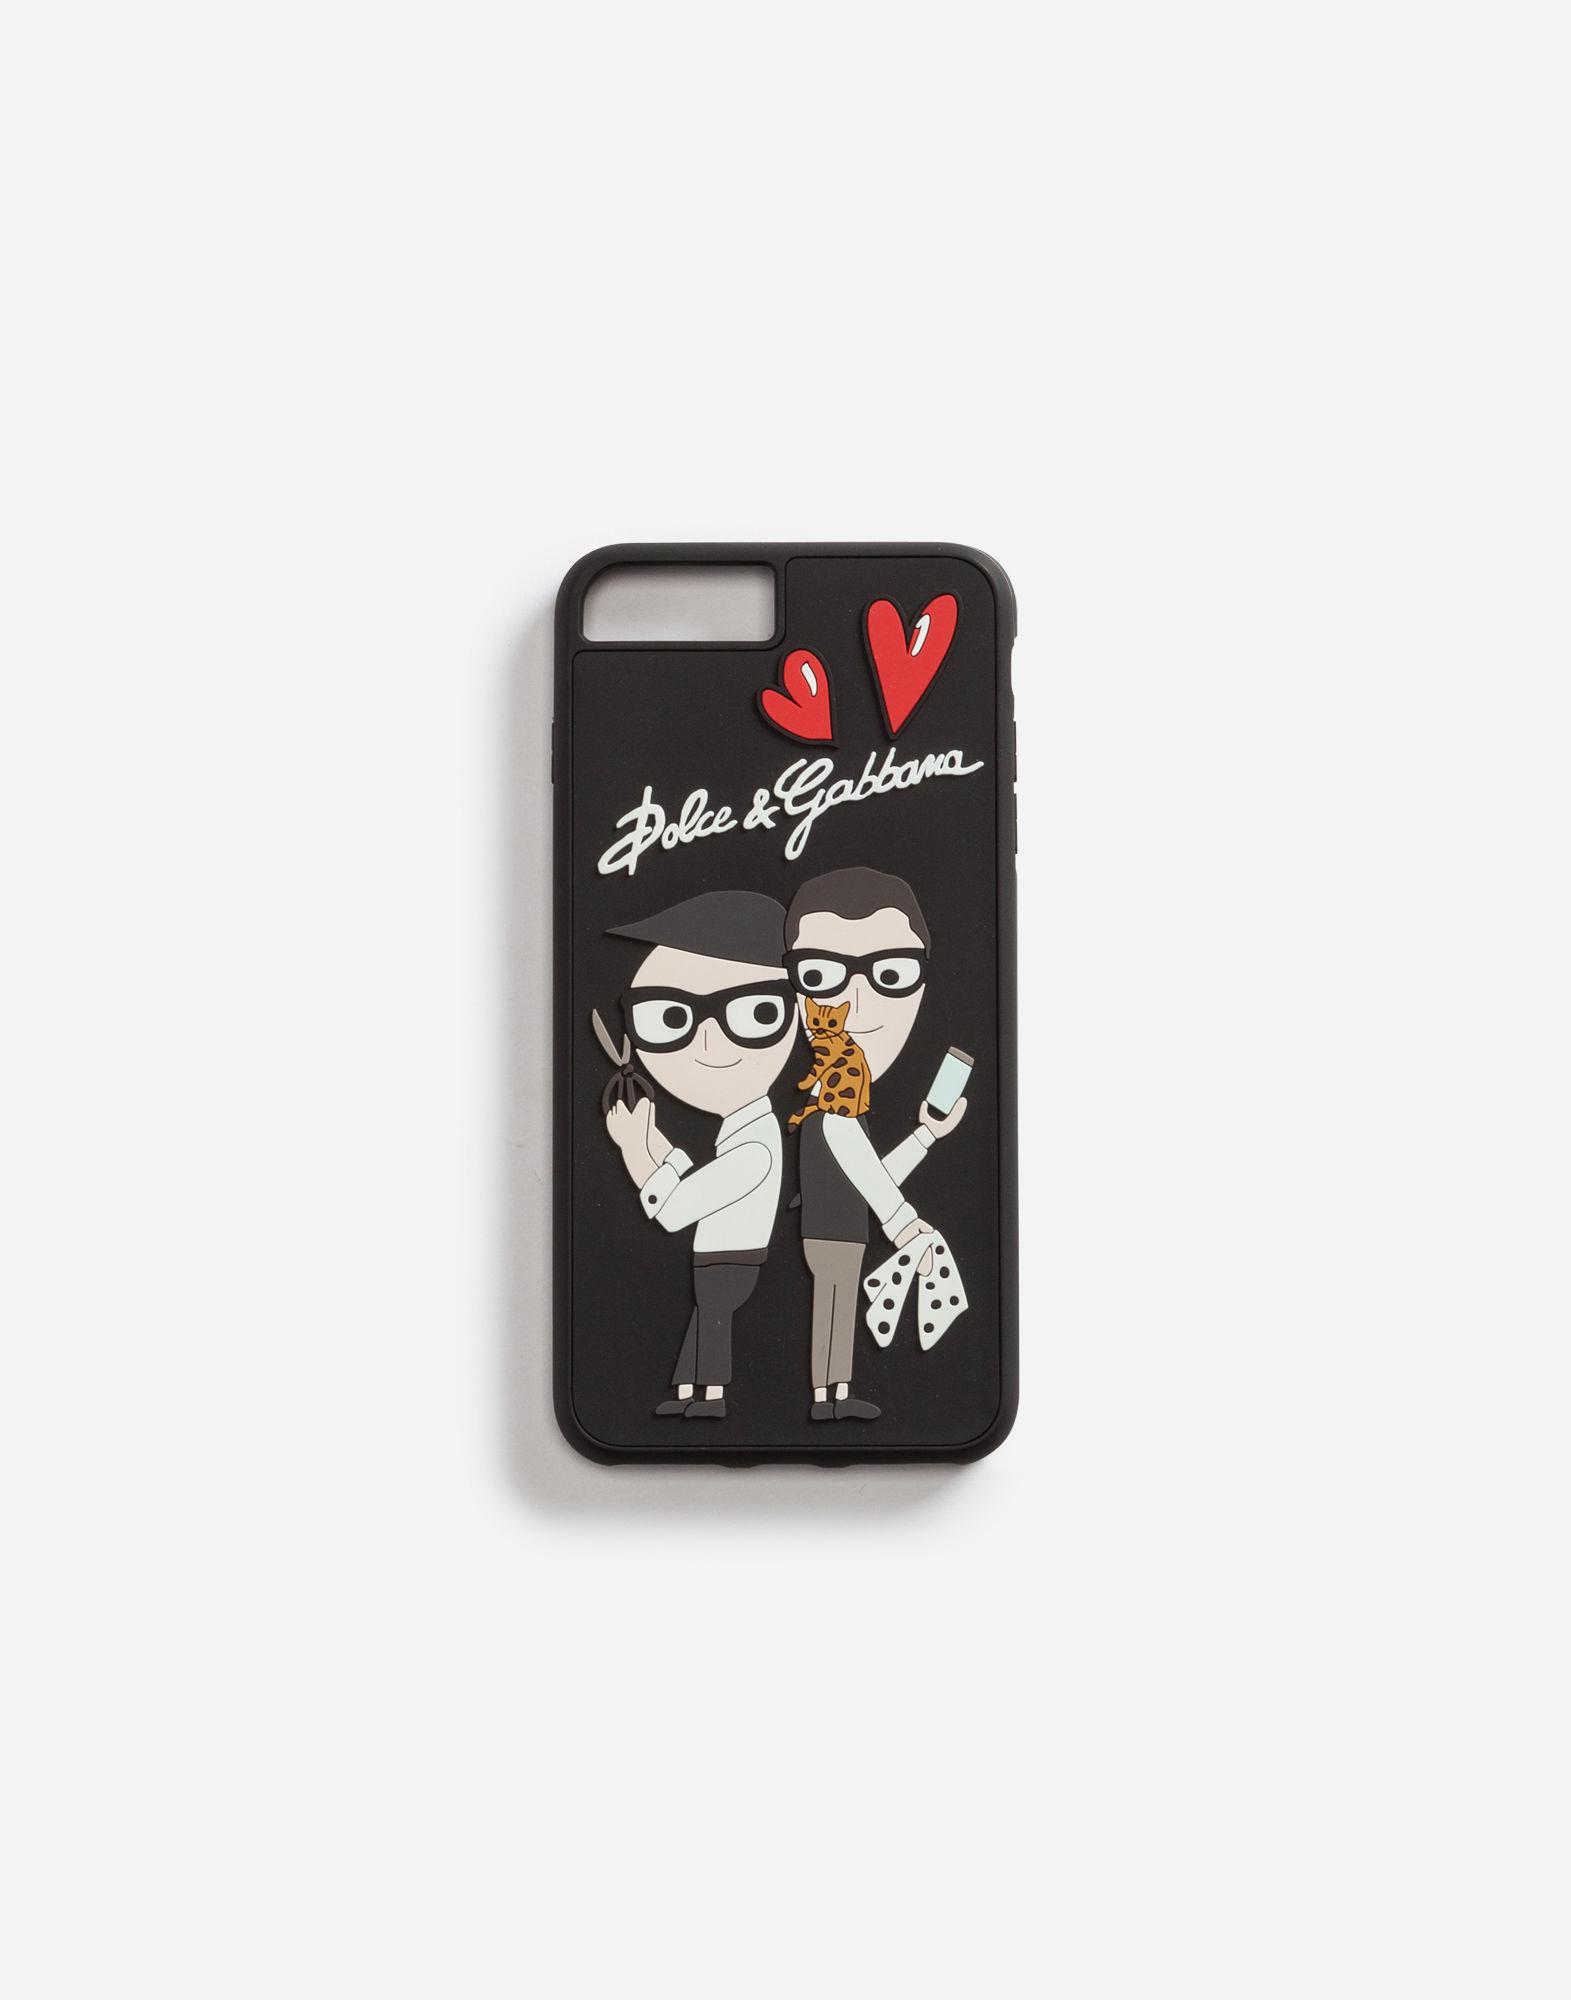 Black Family Designer Rubber iPhone X Case Dolce & Gabbana vSfn6c